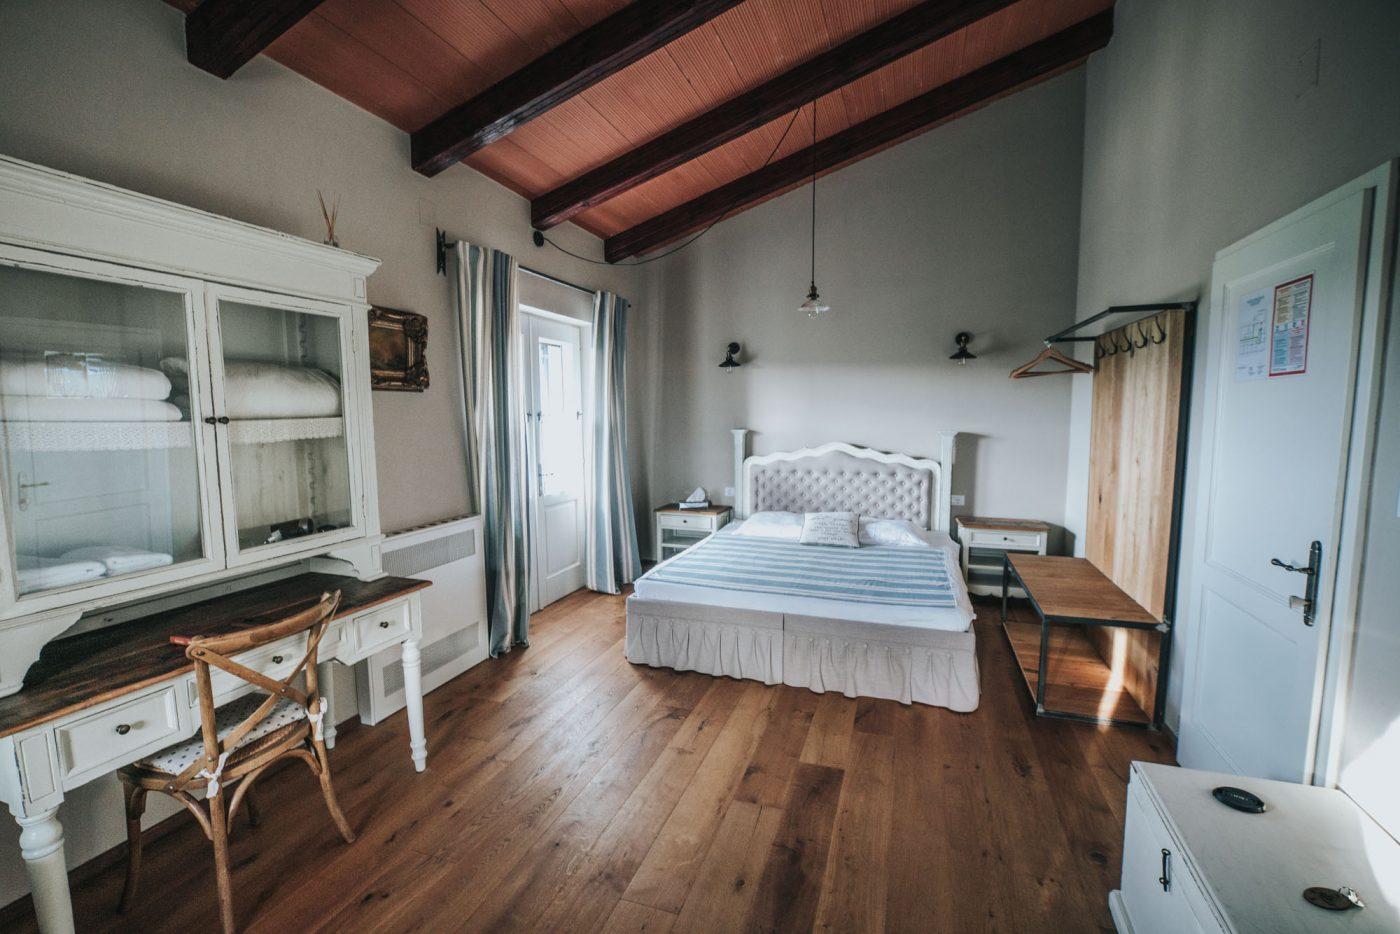 Vipava Valley: Hotel St Daniel